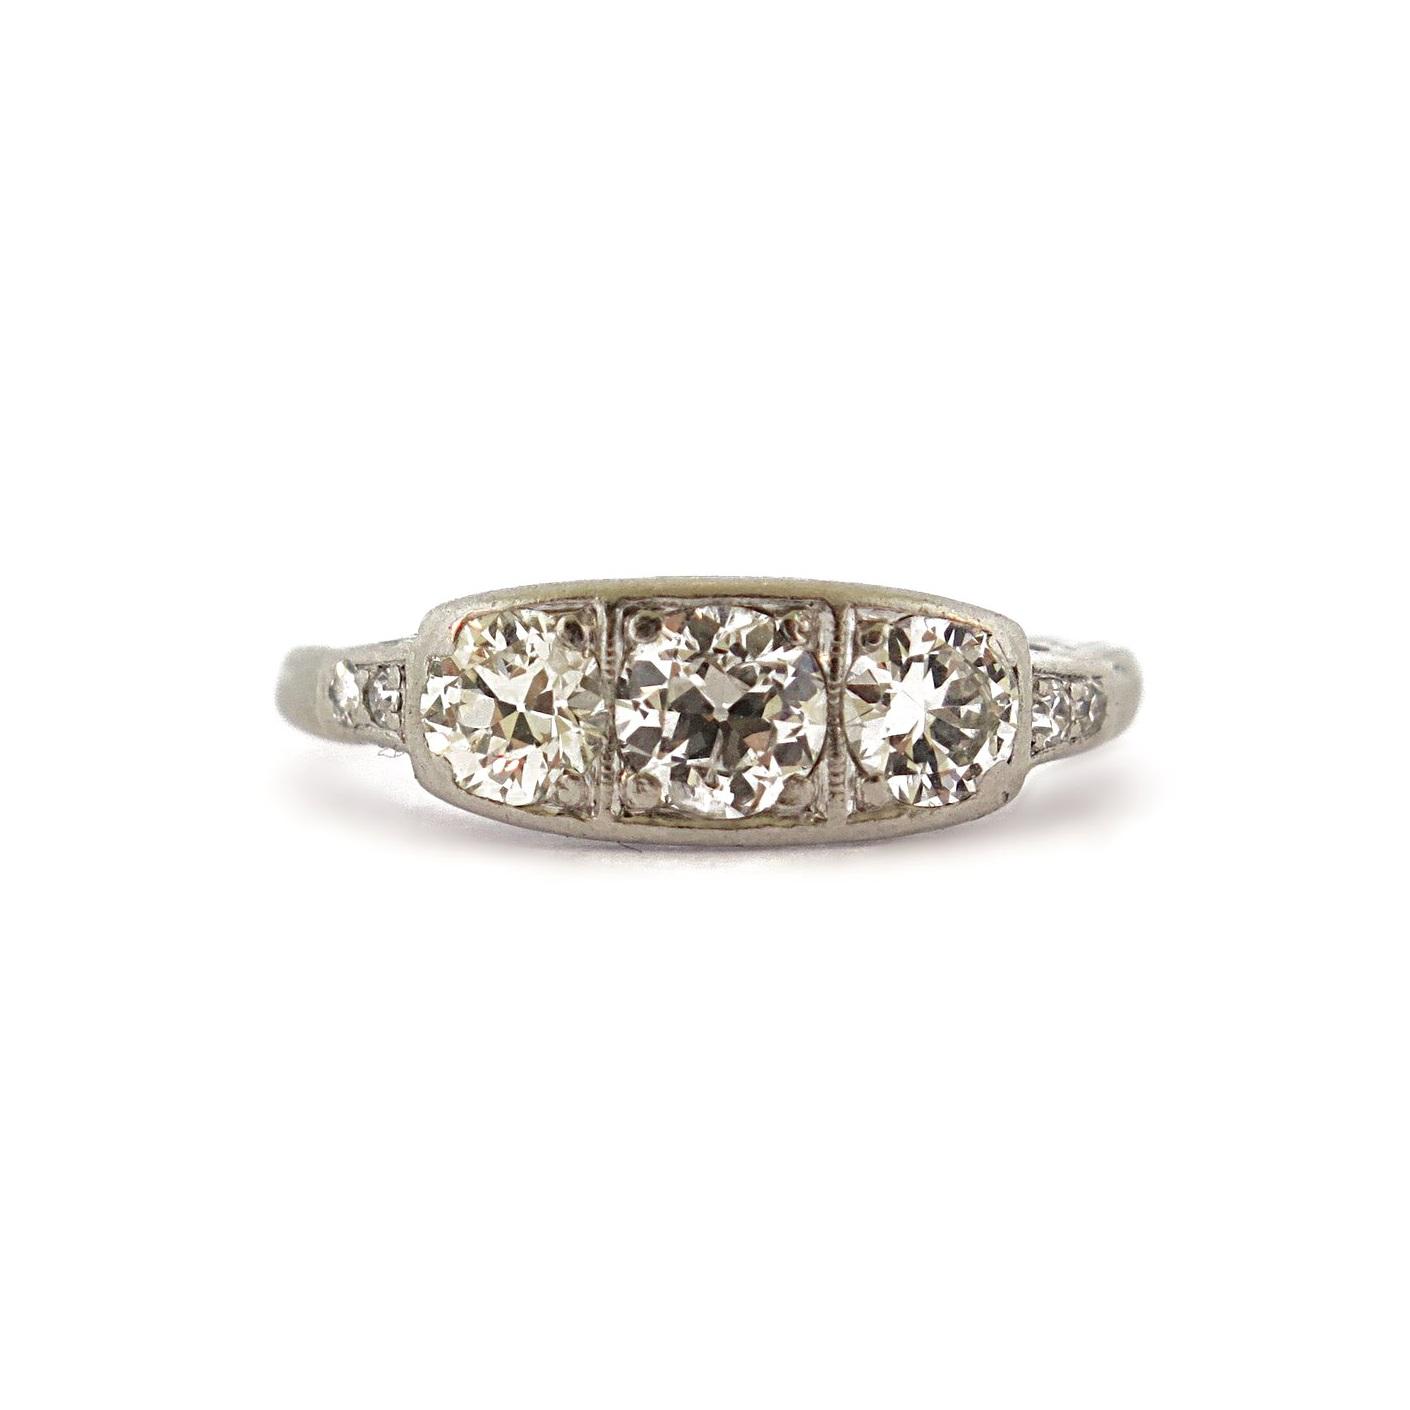 Edwardian Three Stone Diamond Ring